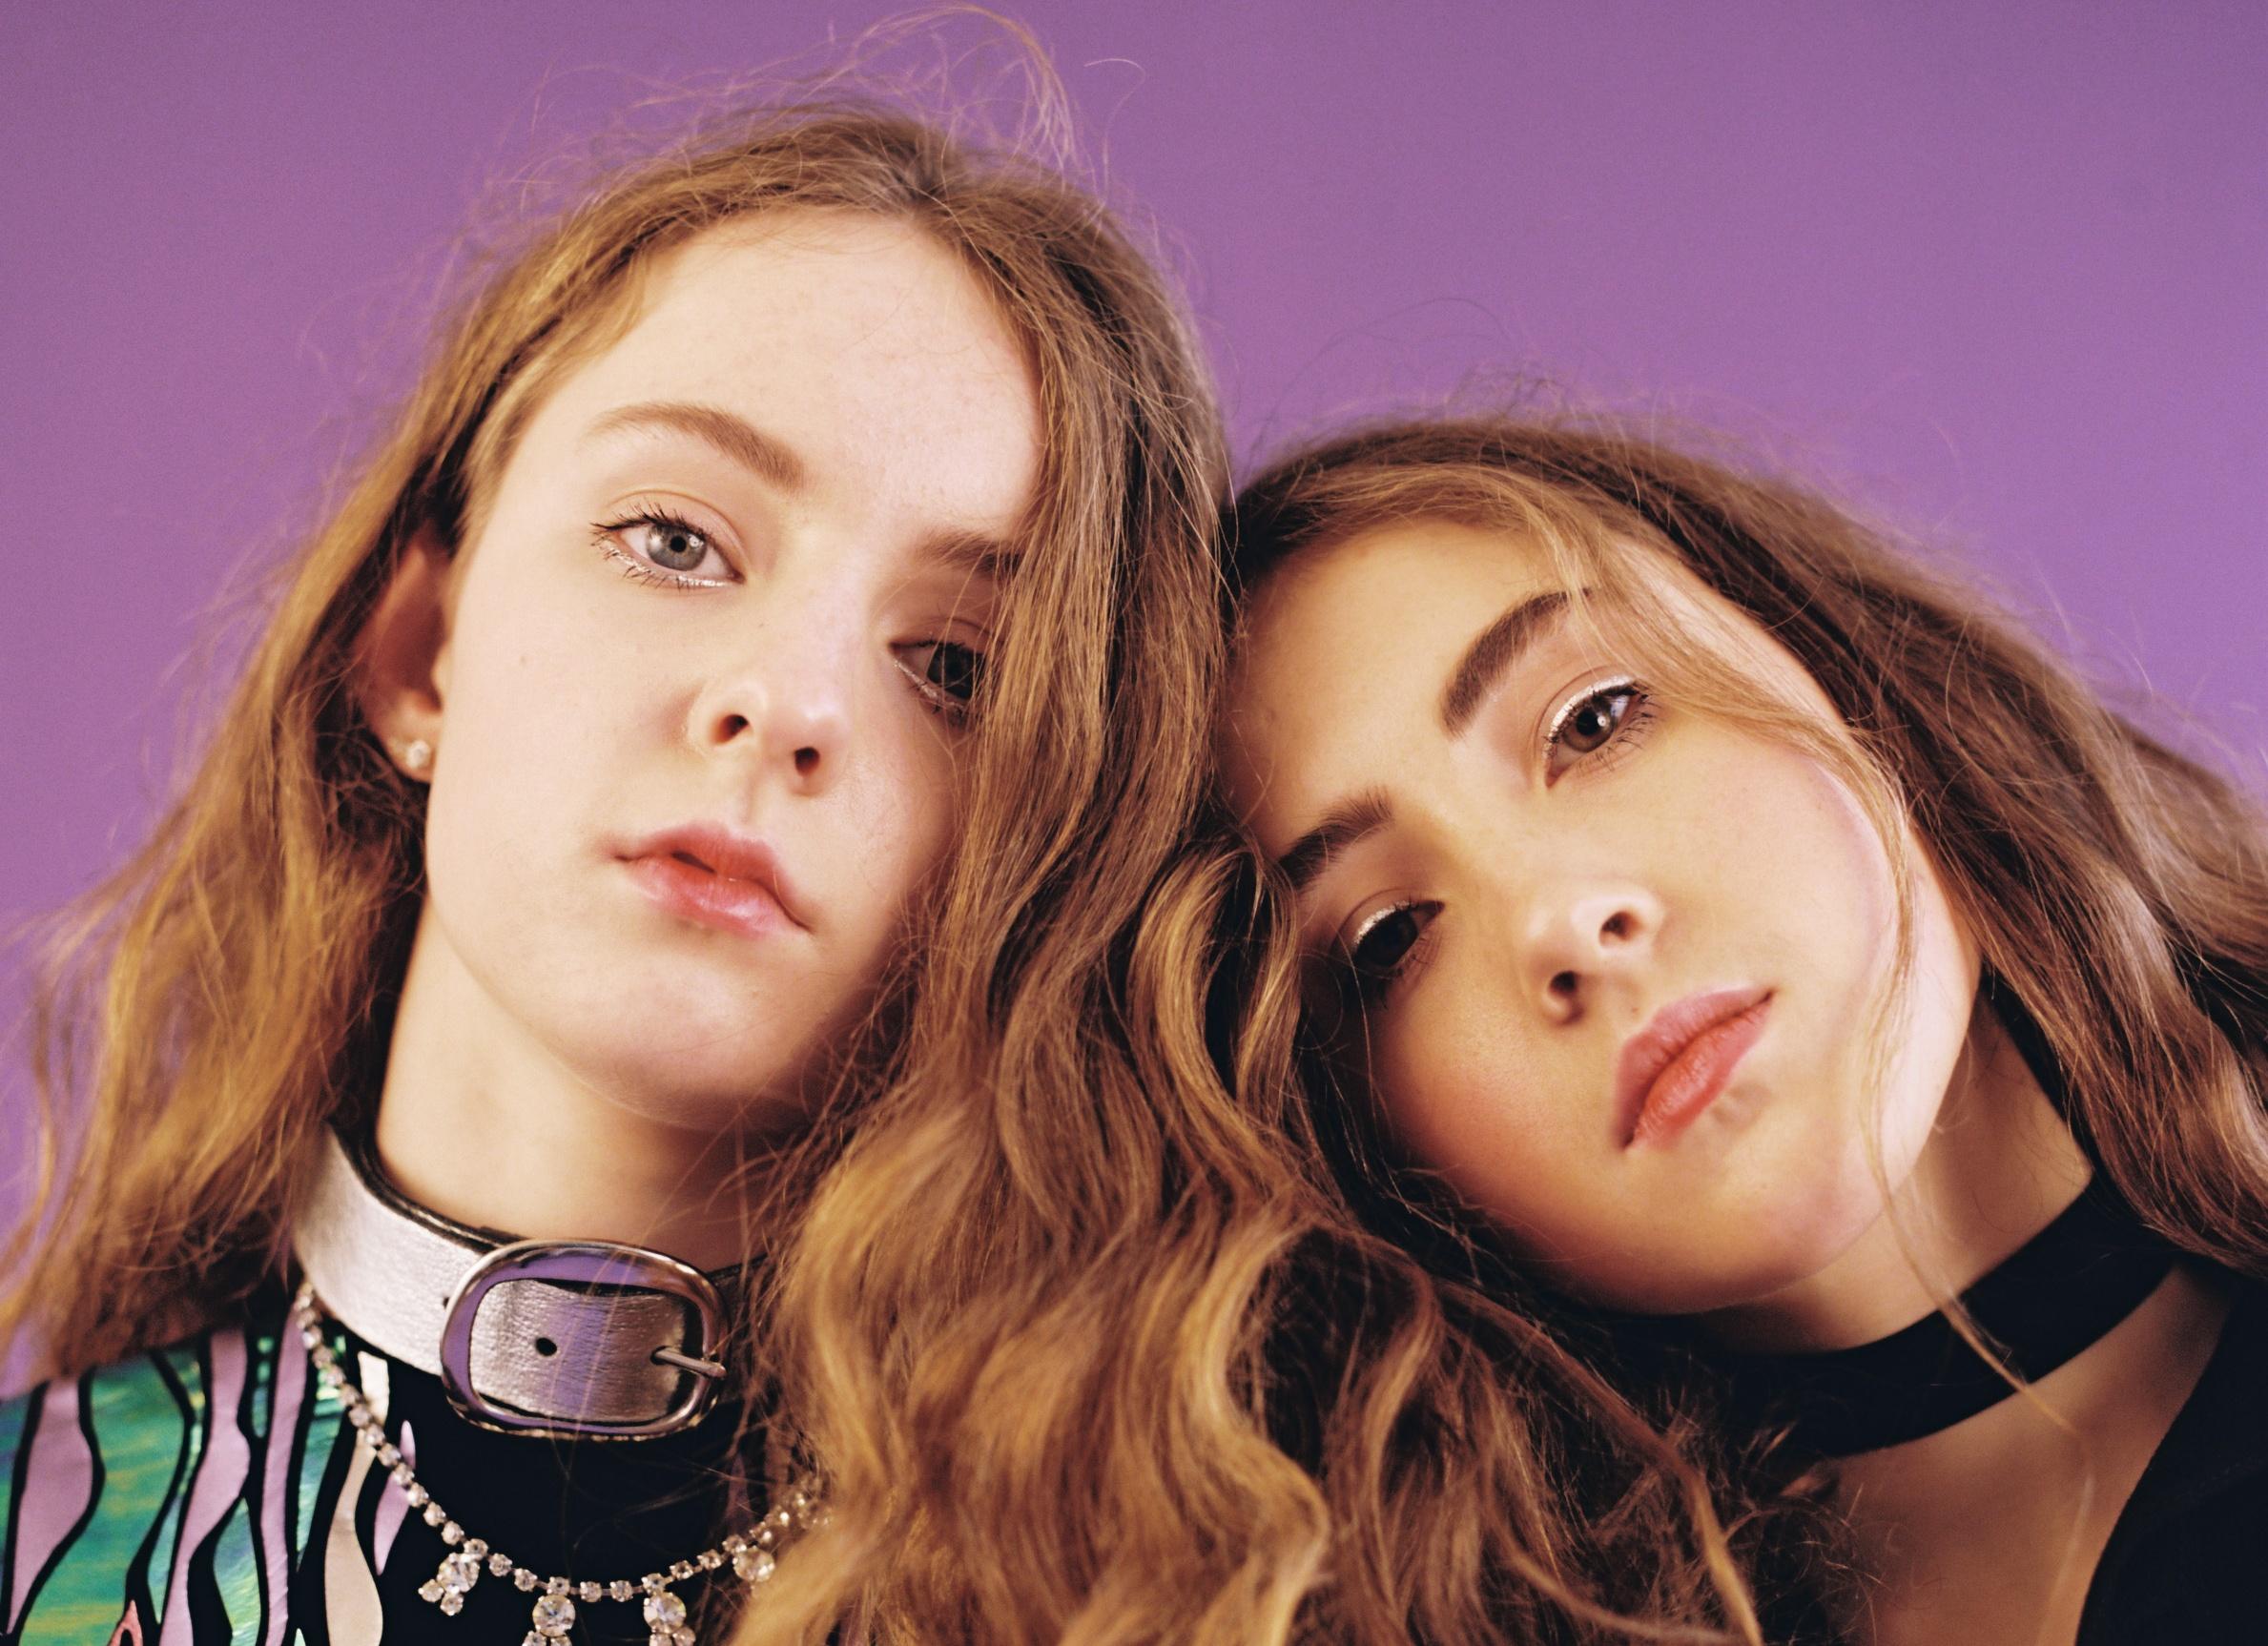 Two straight teens